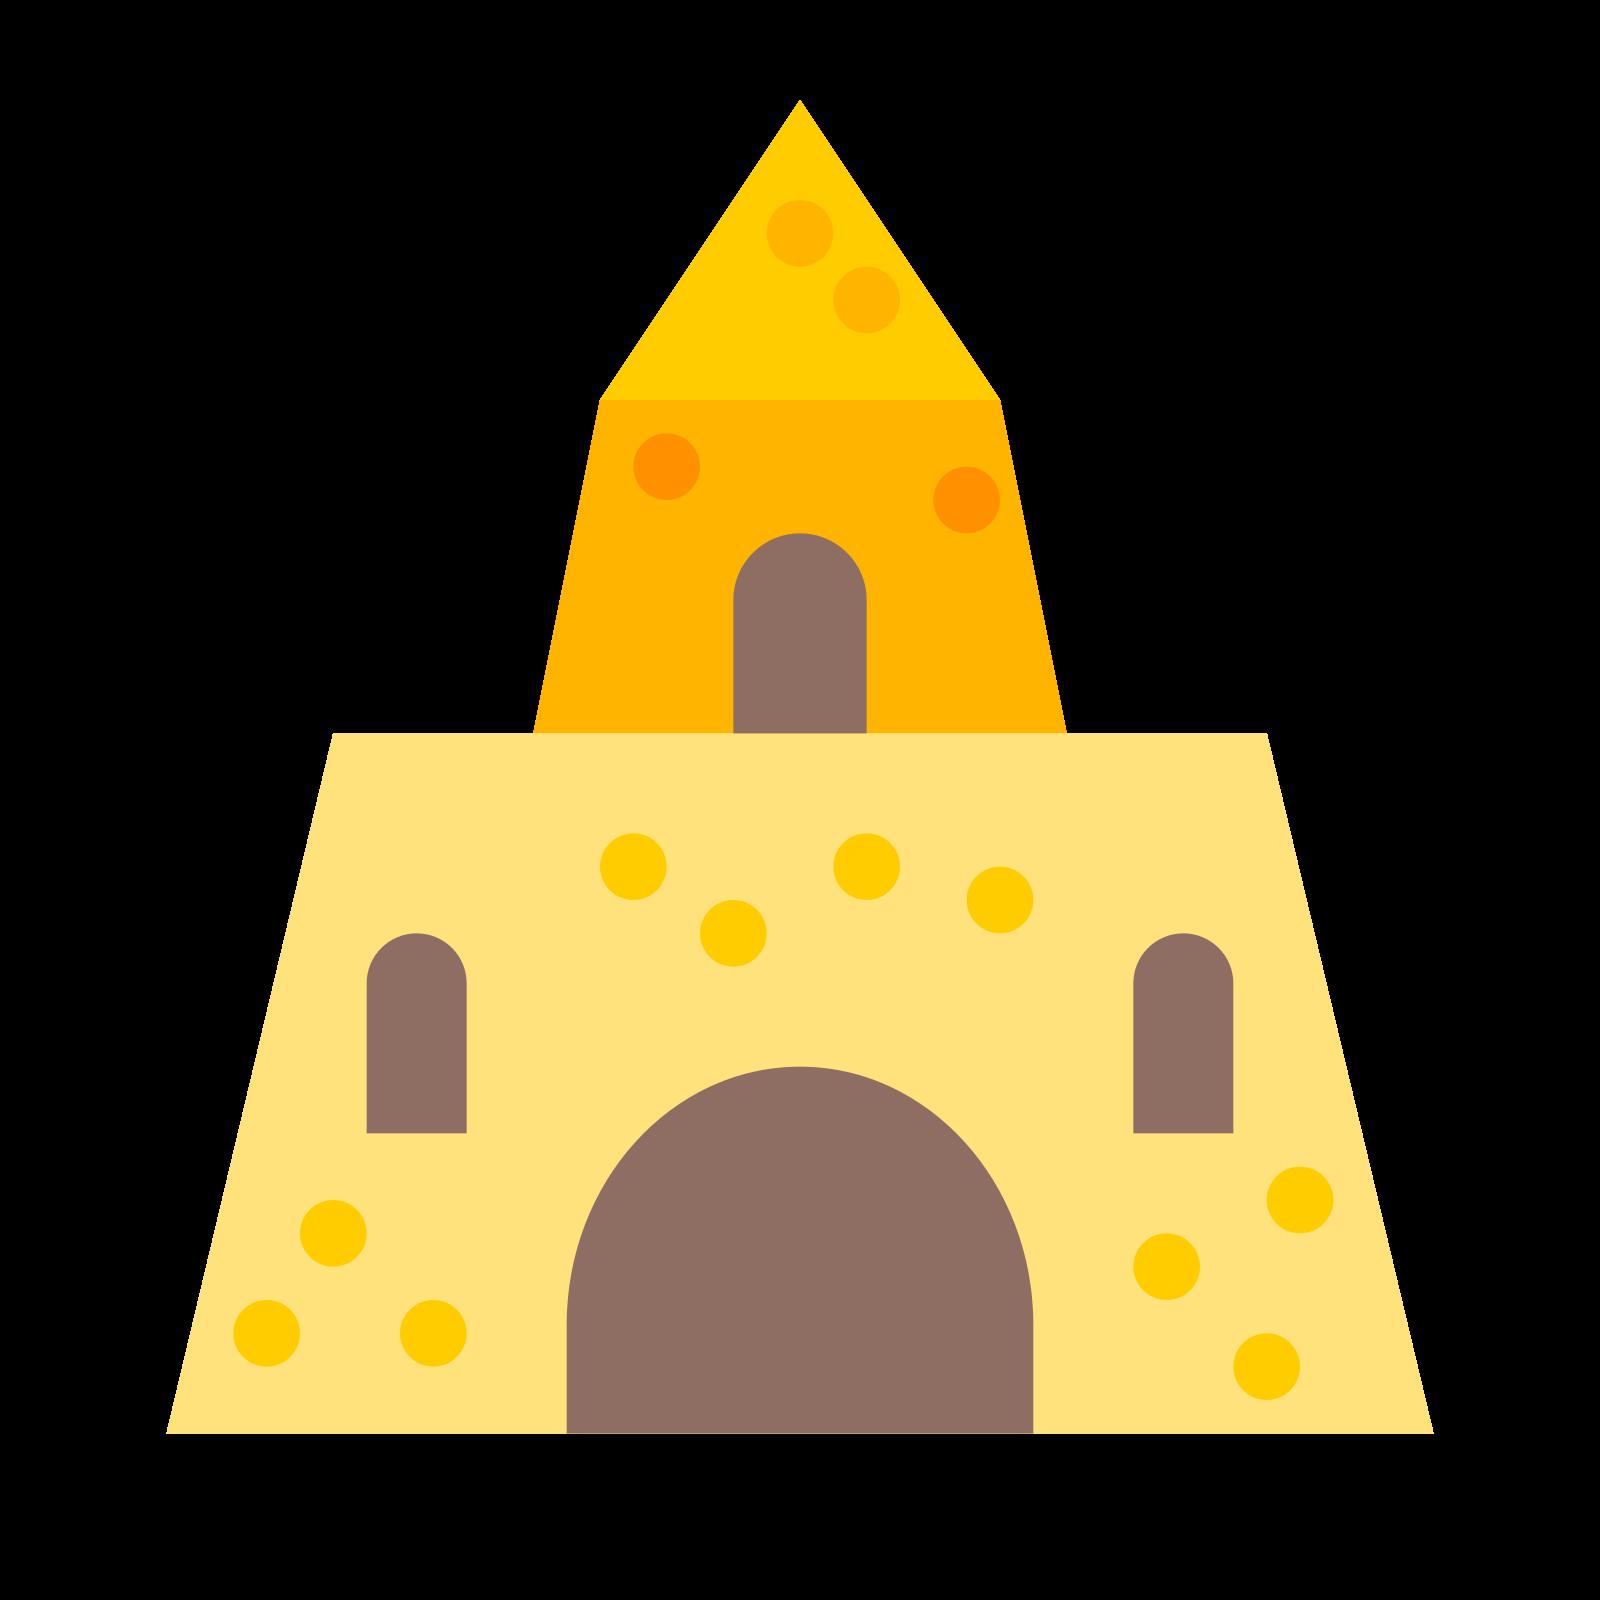 沙子城堡 icon